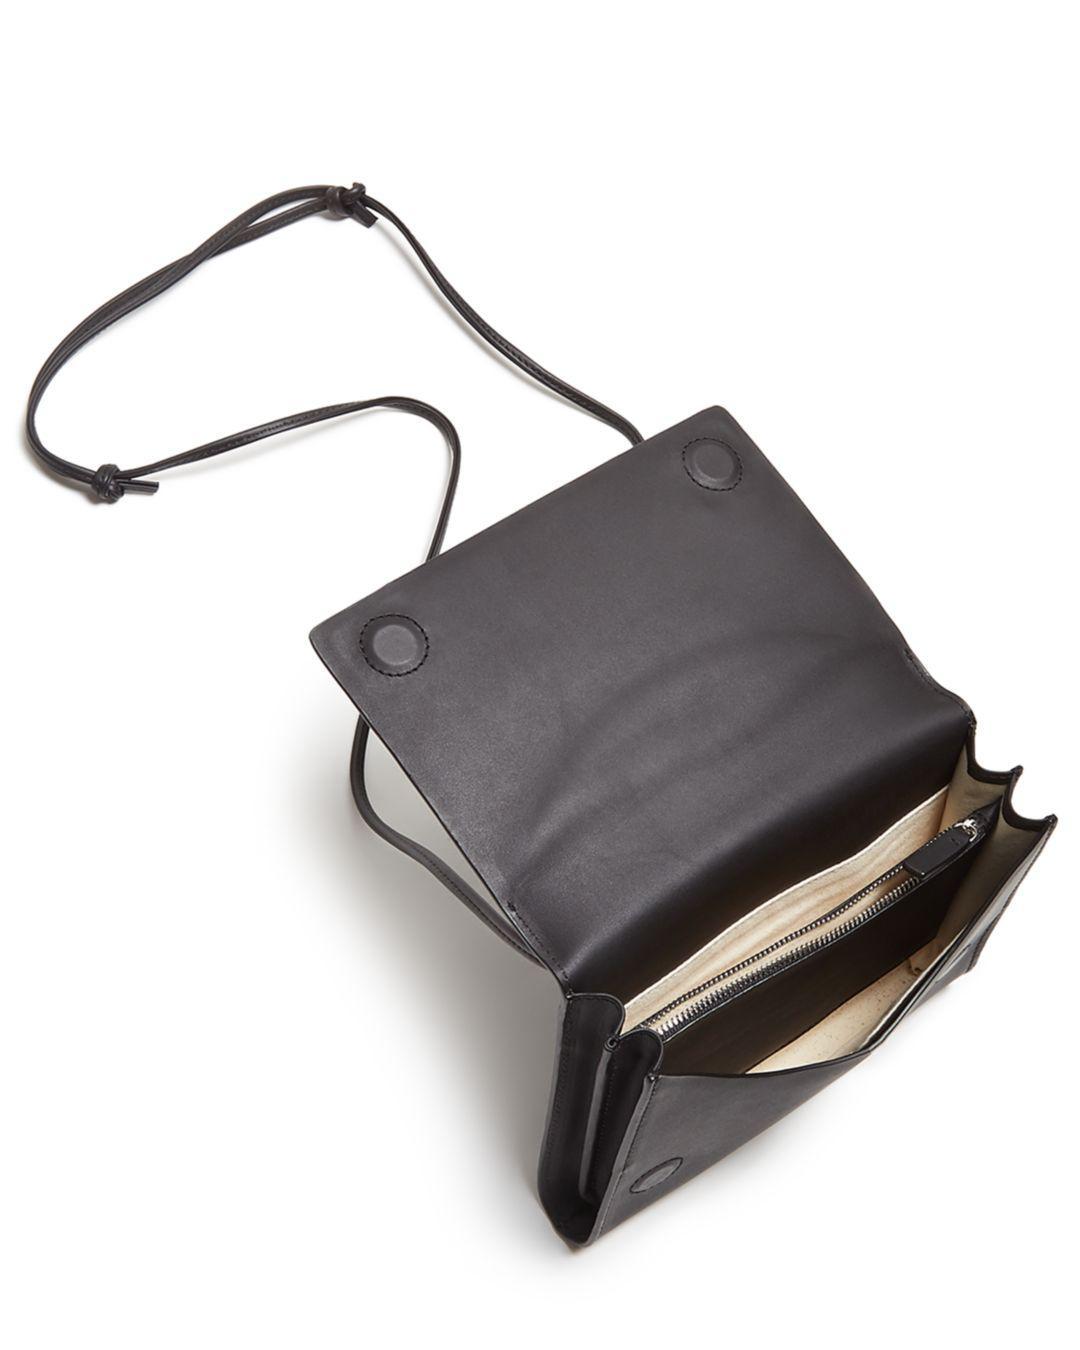 17a4e366f13e Baggu Compact Leather Crossbody in Black - Lyst